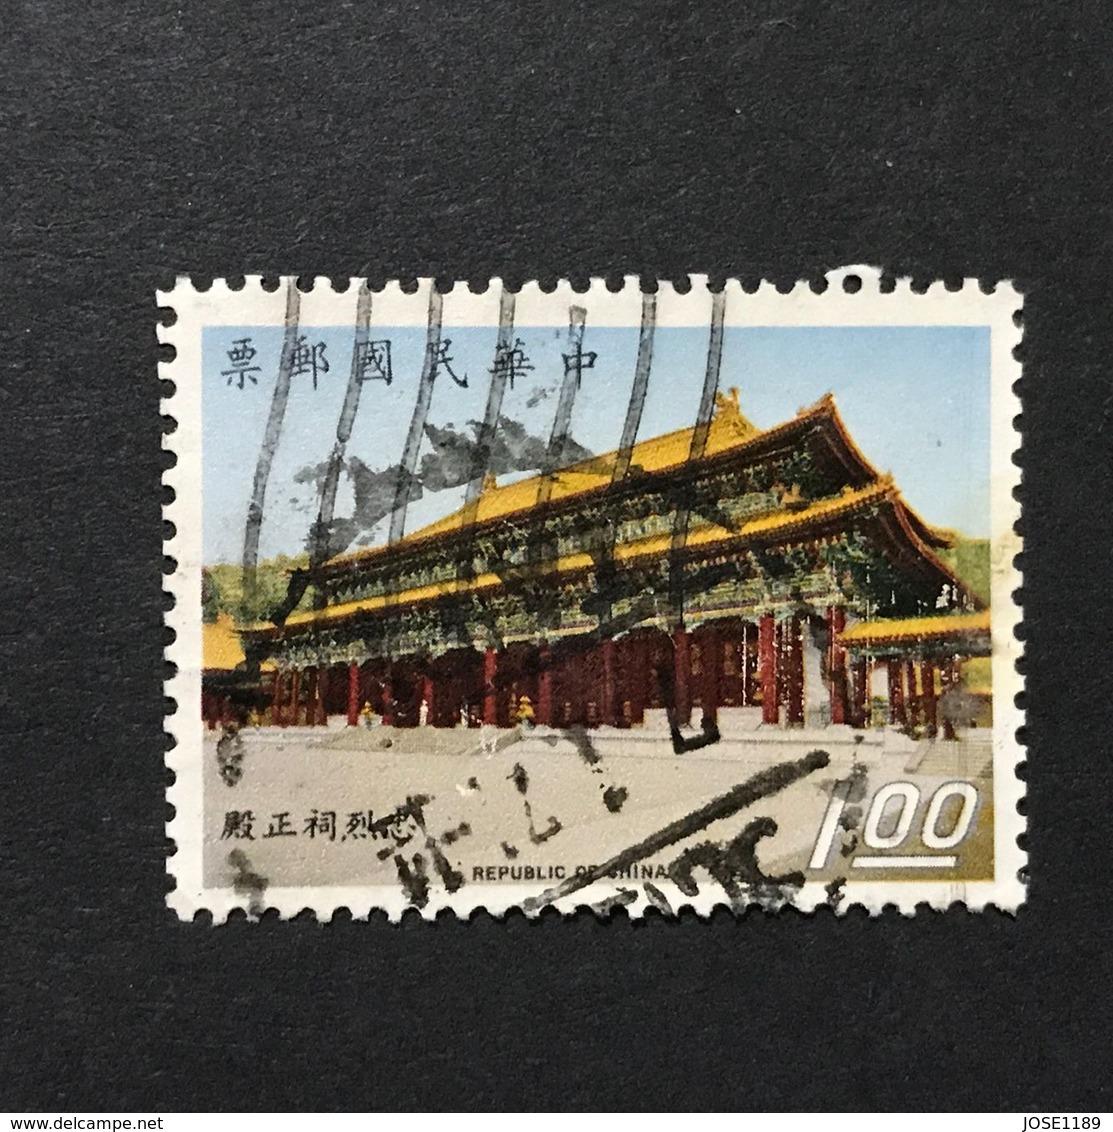 ◆◆◆Taiwán (Formosa)  1970  Martyrs' Shrine, Taipei     $1   USED   AA2303 - 1945-... República De China